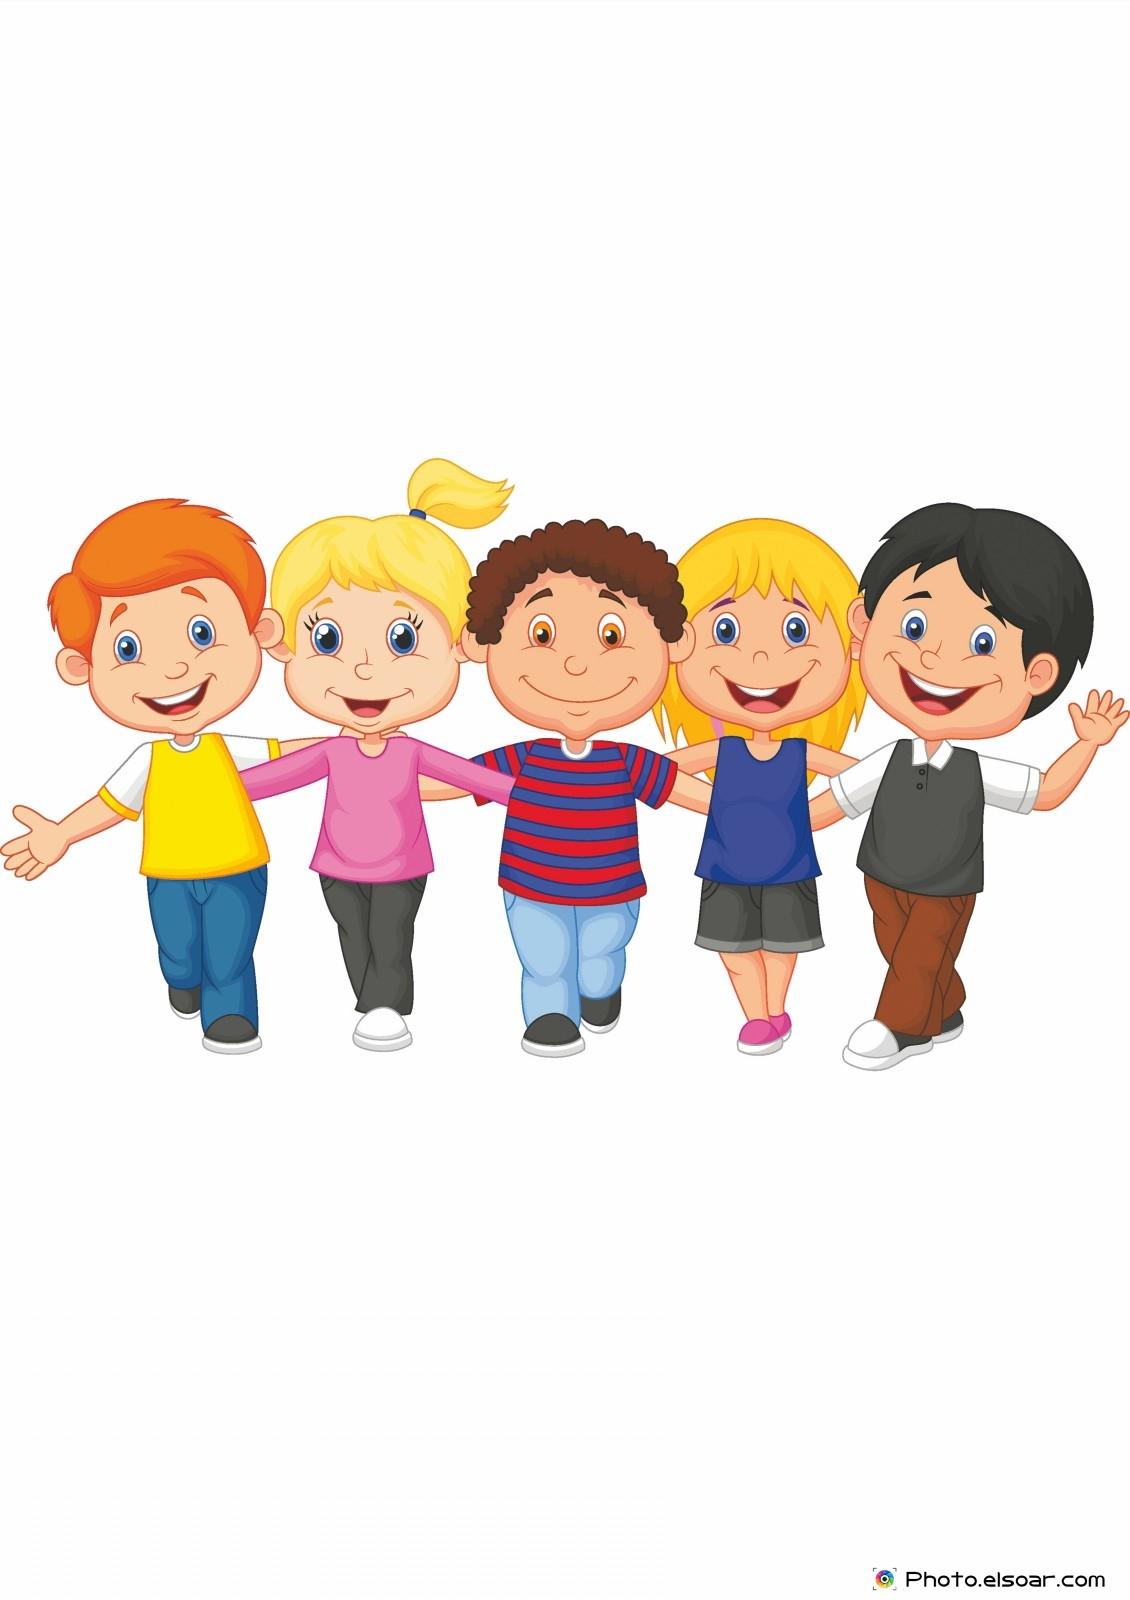 happy kid walking together - Cartoon Kid Images